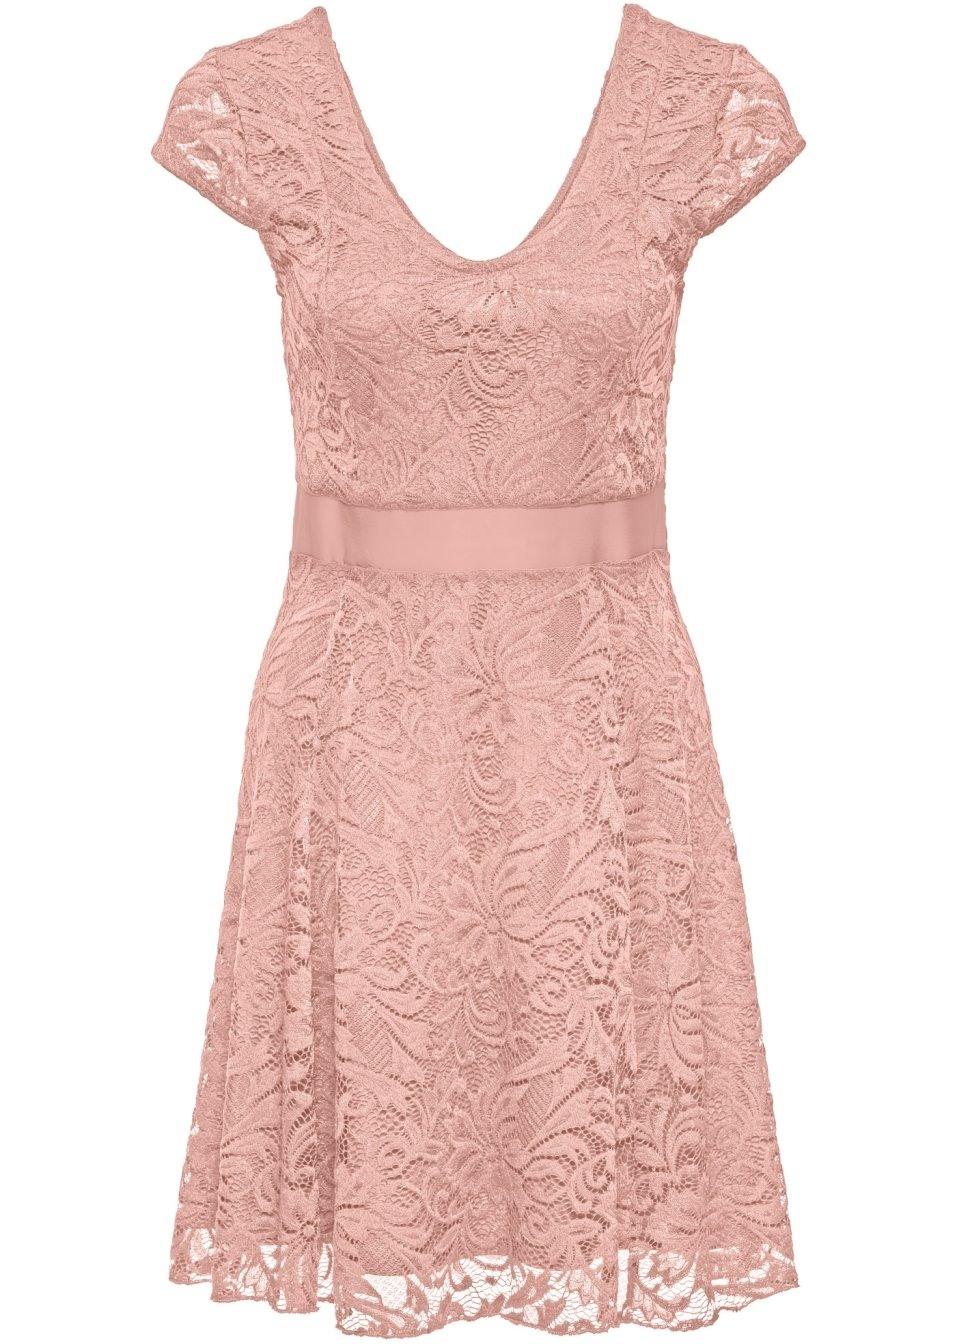 Spektakulär Kleid Rosa Langarm GalerieFormal Schön Kleid Rosa Langarm Vertrieb